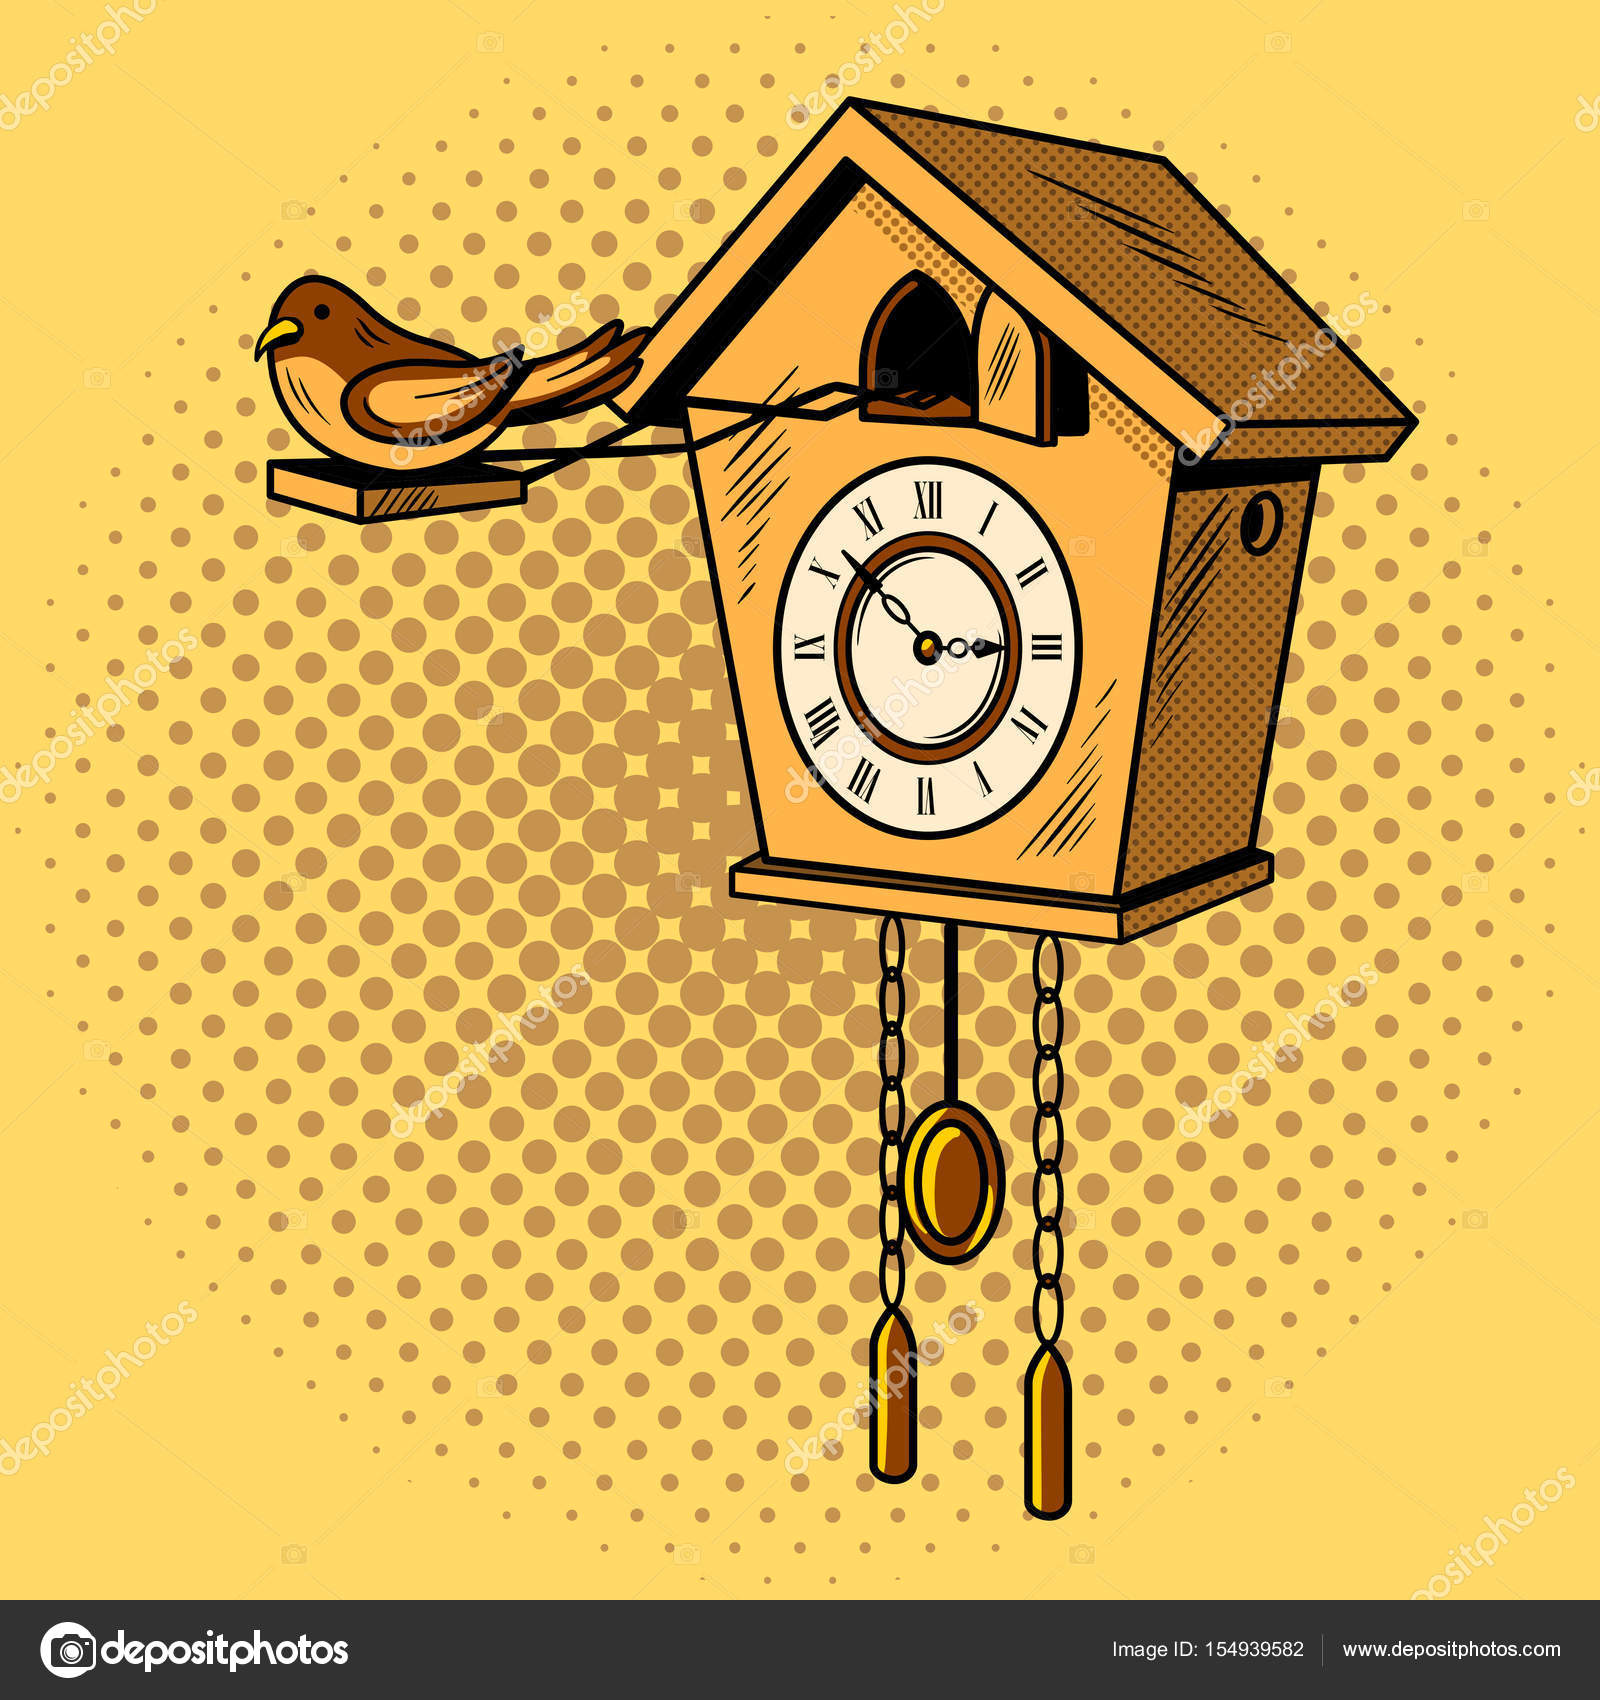 26a2733d2e1 Relógio cuco quadrinhos pop arte retrô style vector illustratoin — Vetor de  AlexanderPokusay